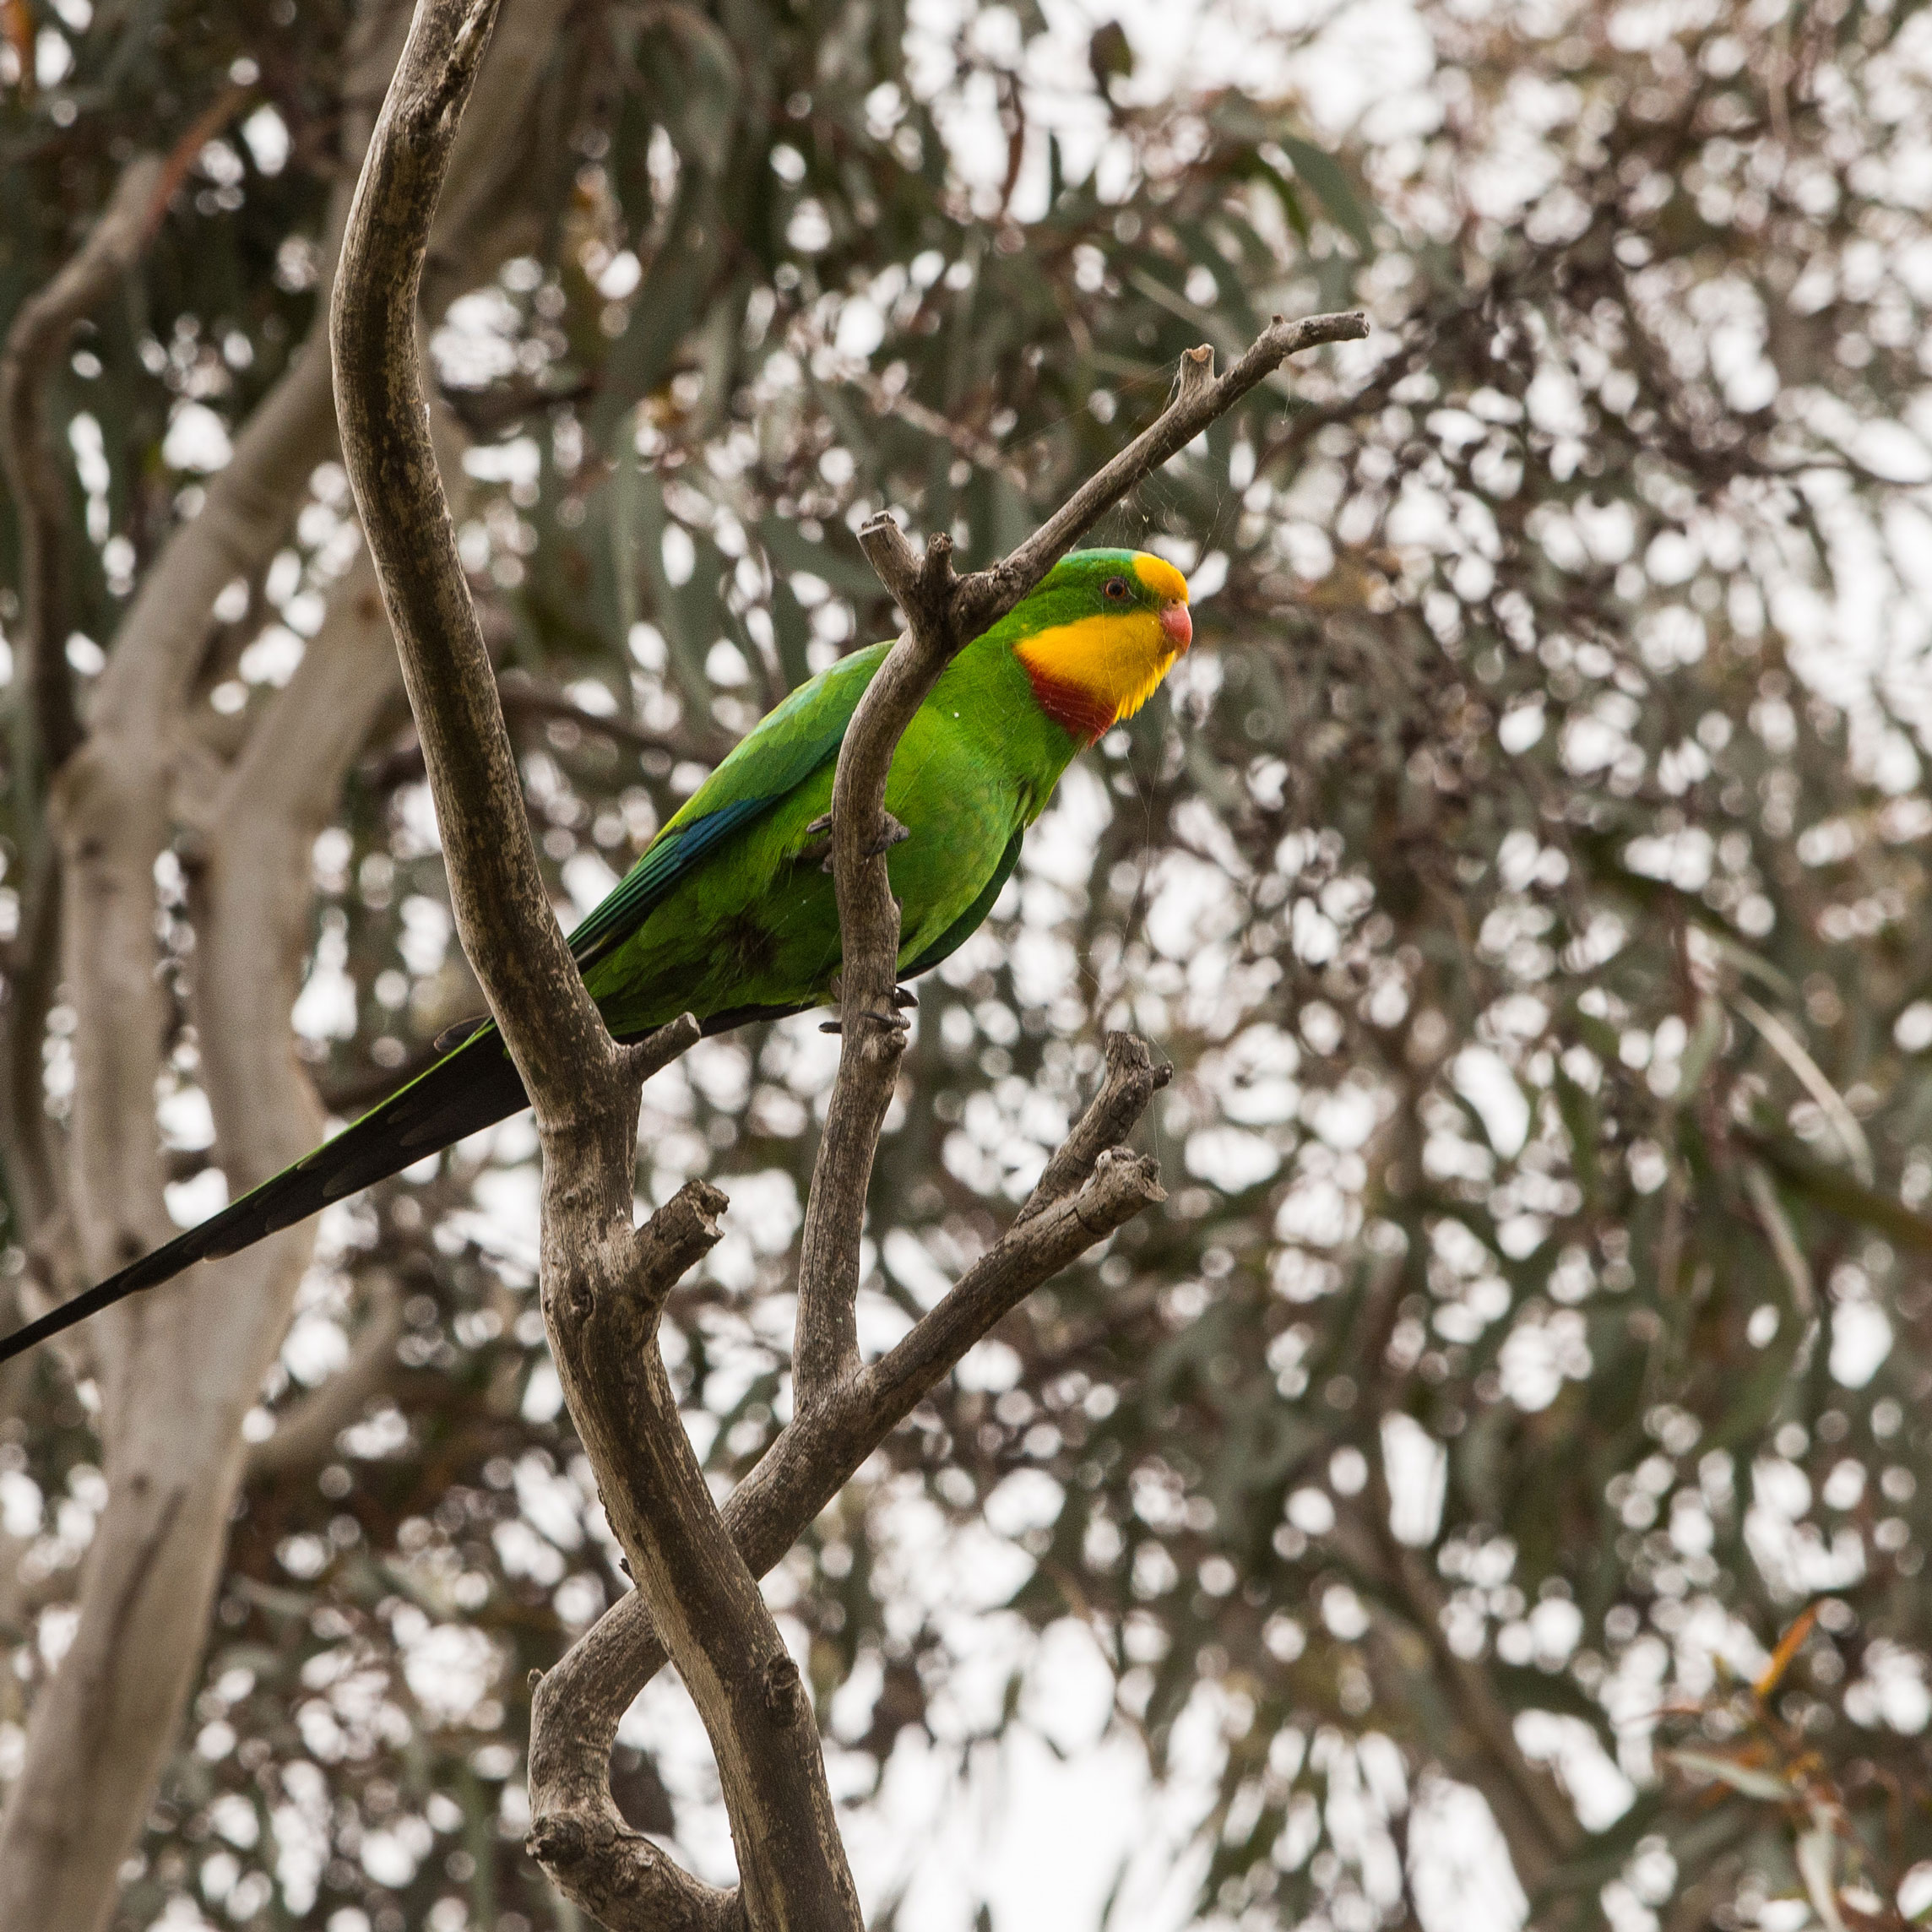 Superb-Parrot-0883.jpg